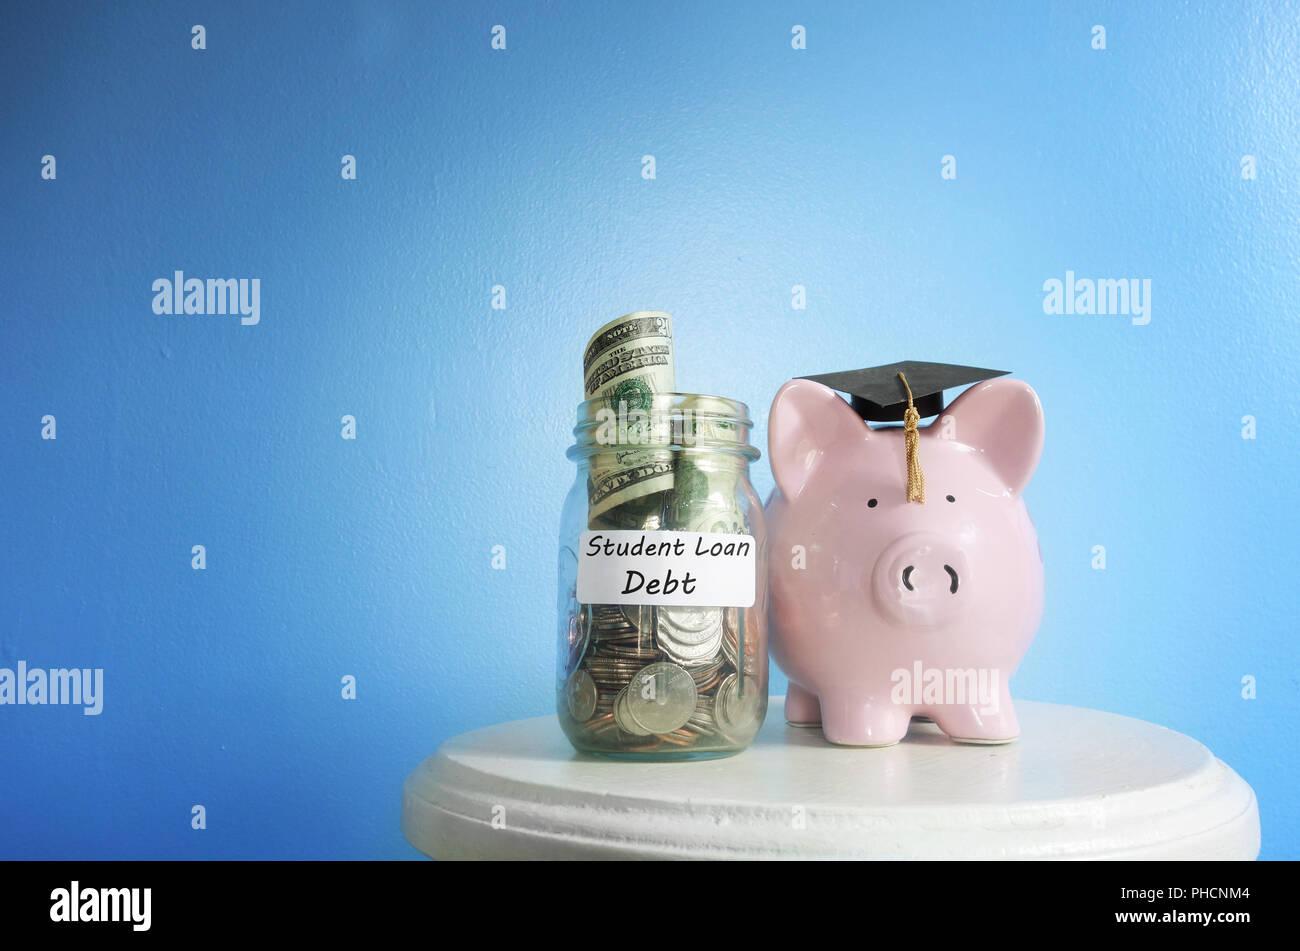 Student Loan debt - Stock Image